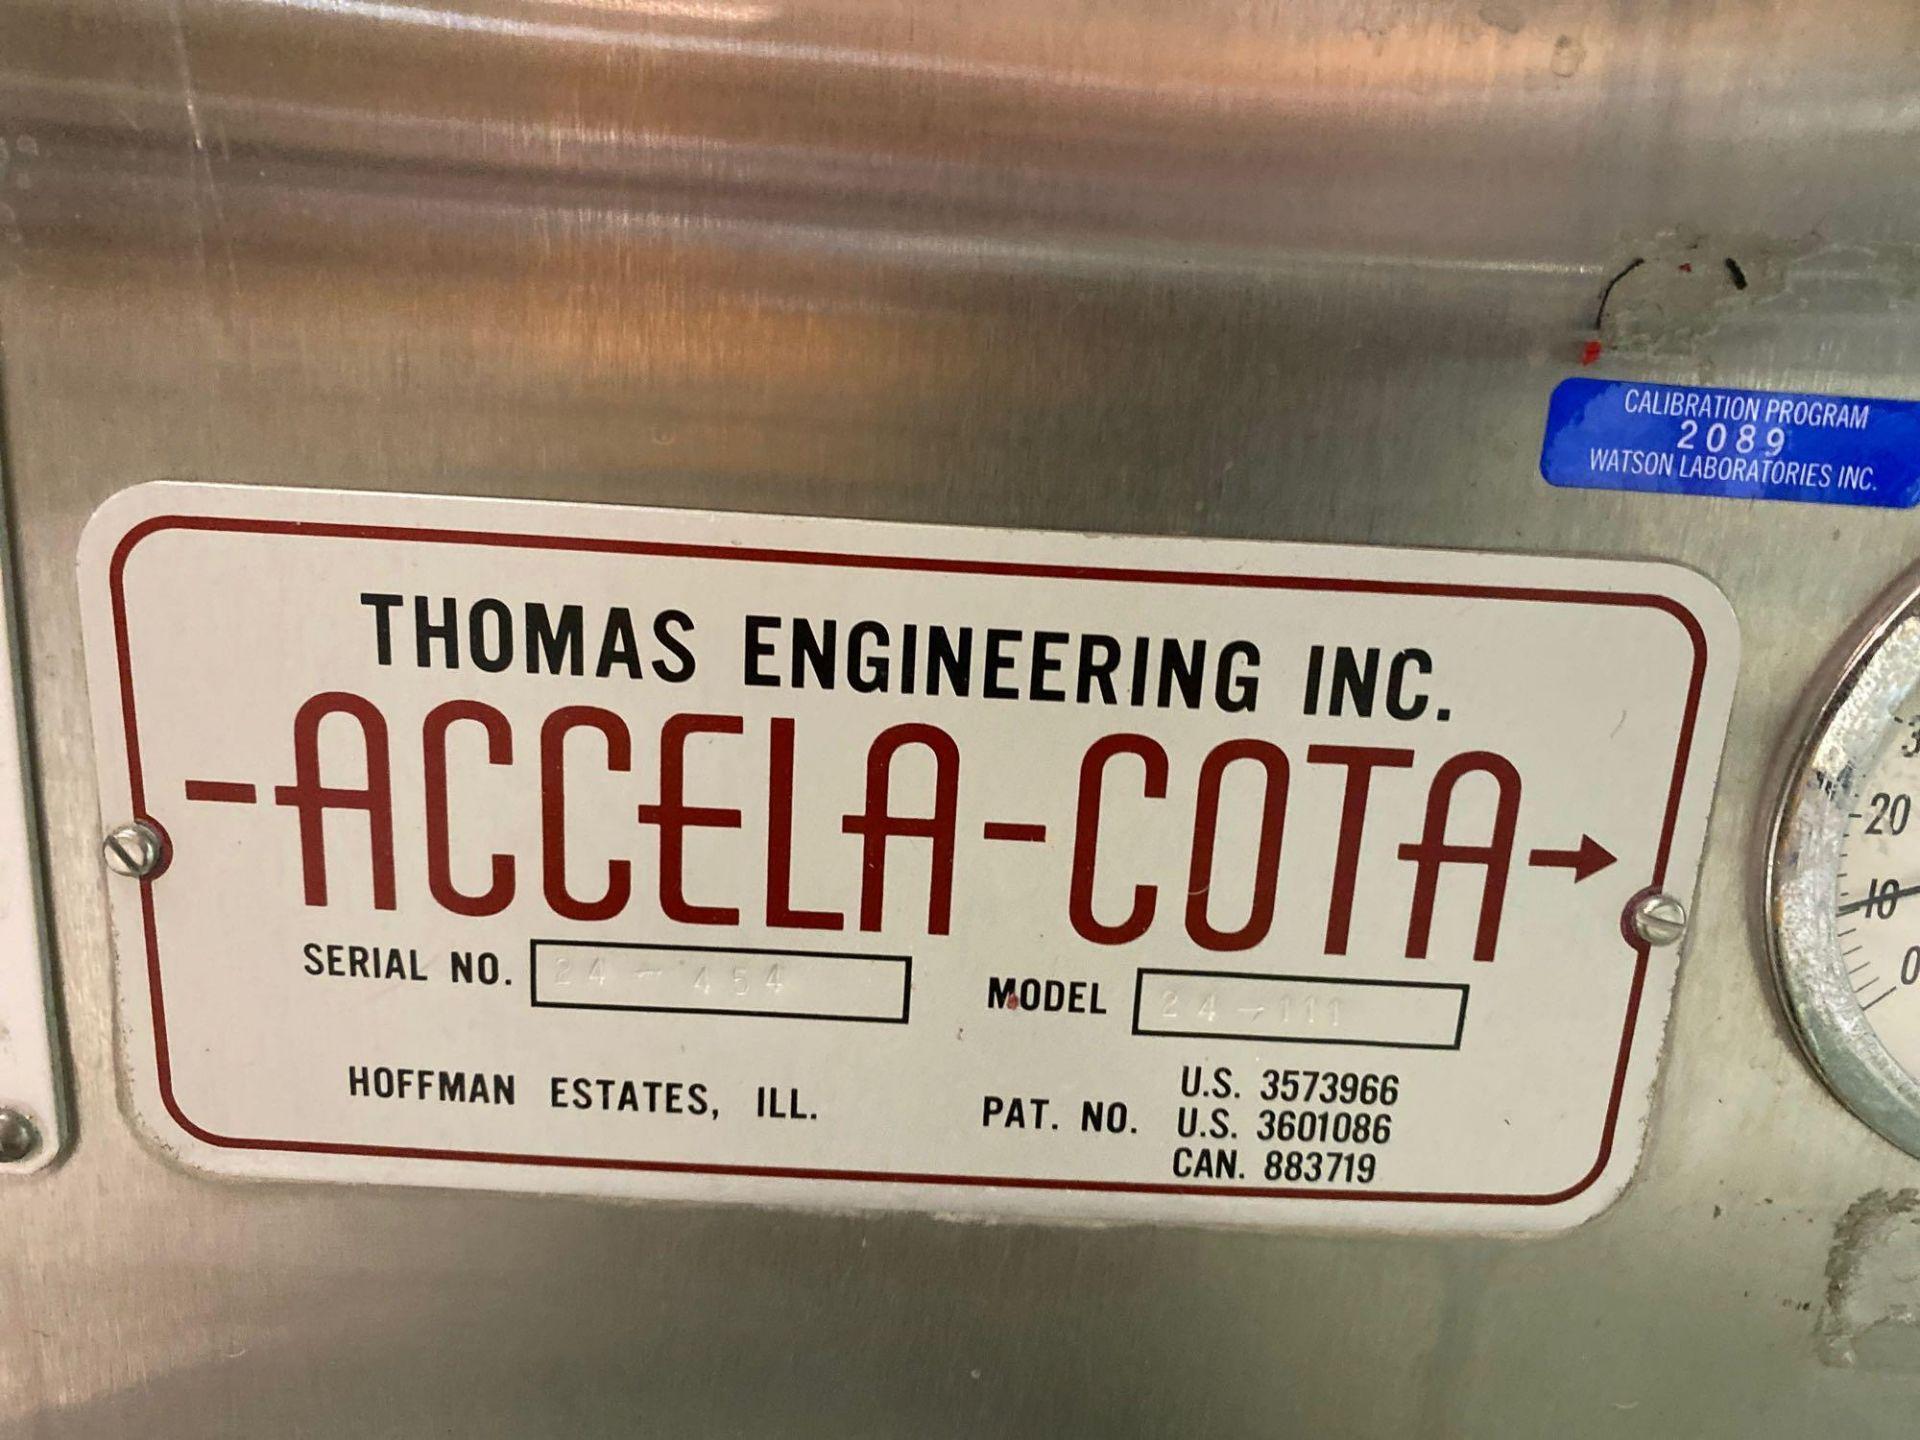 Accela-Cota Coater - Image 2 of 10